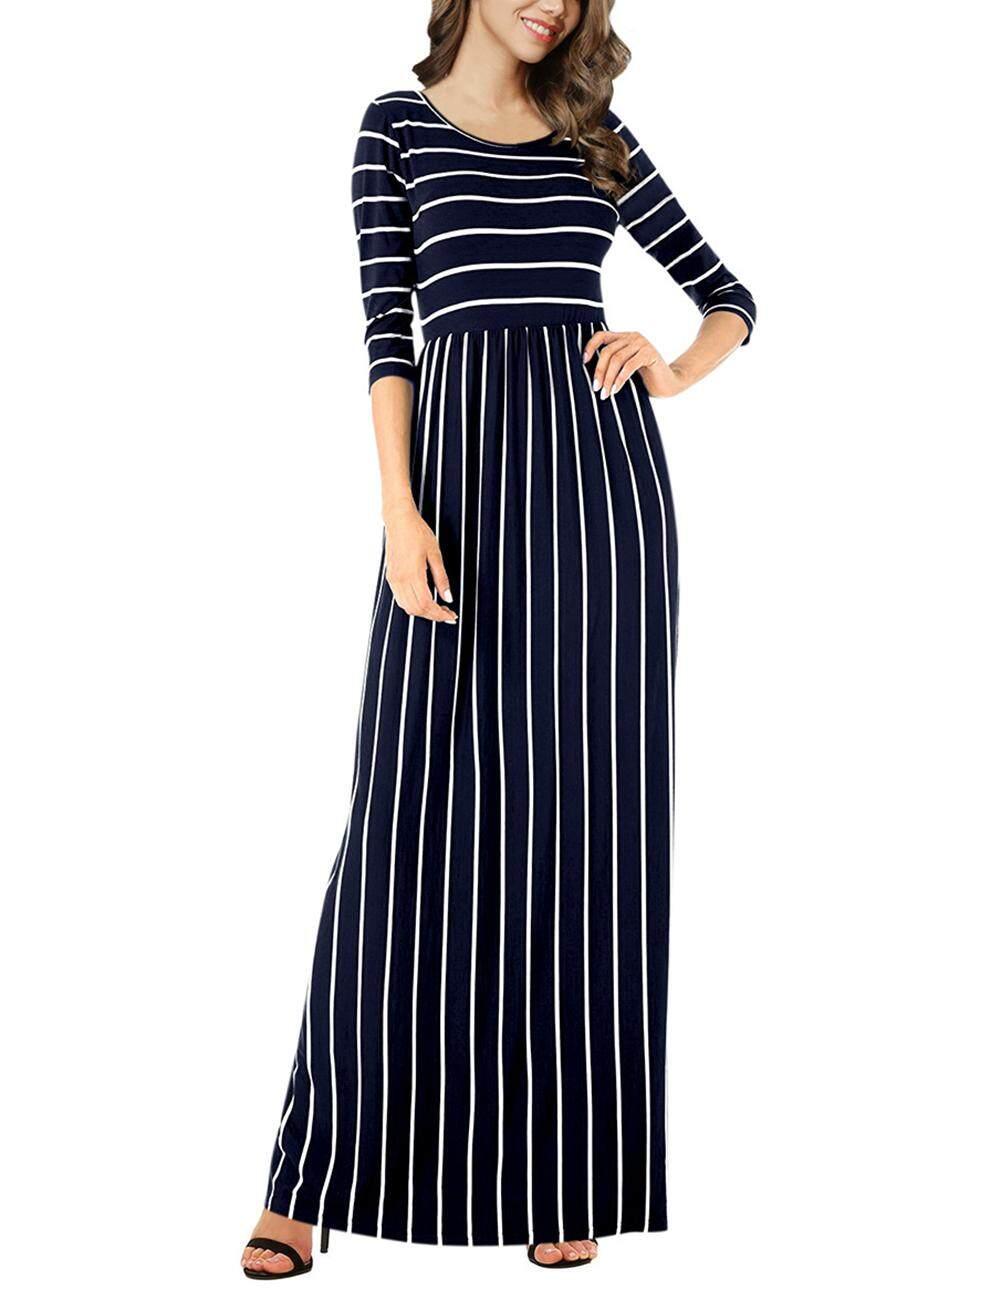 ee68fa6c0dbcf Veecome Women Round Neck Long Dress Elastic Waist Stripe Dresses For Summer